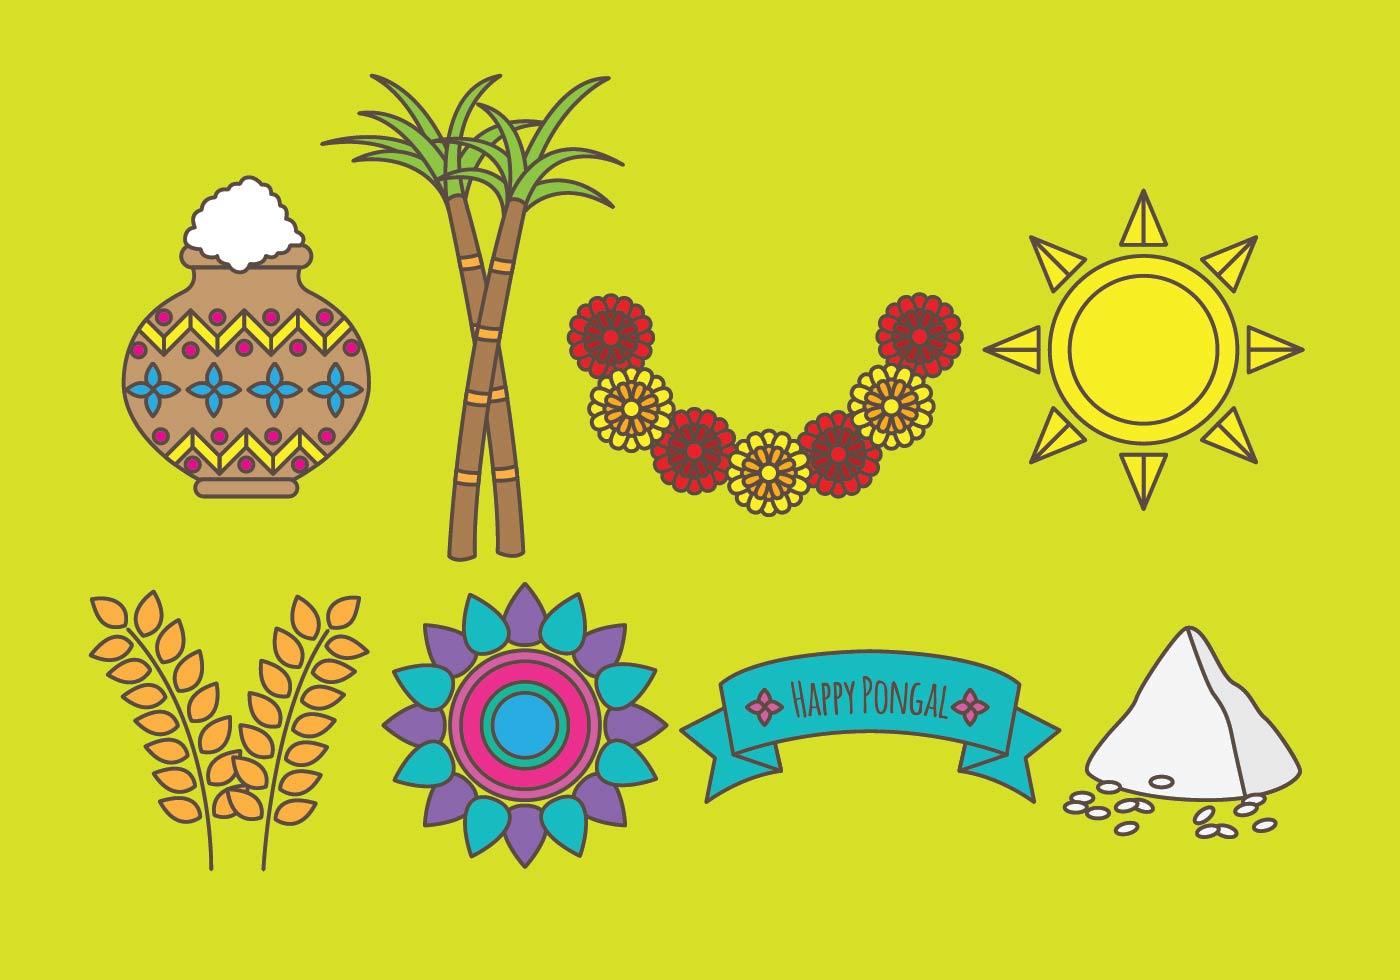 Pongal Free Vector Art 6721 Free Downloads